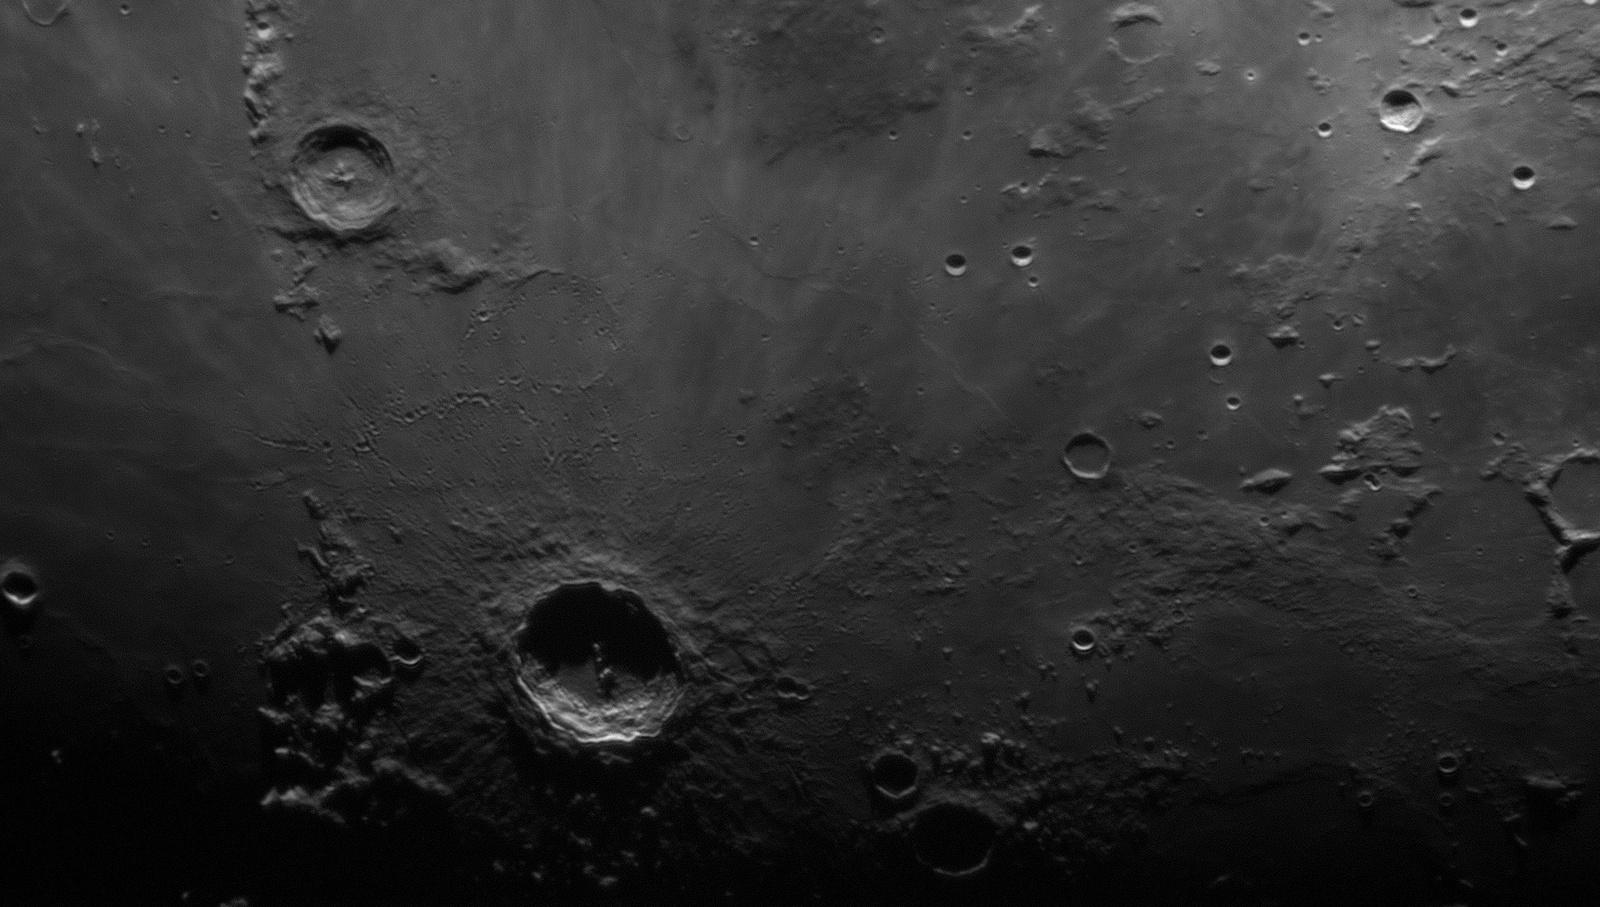 362056086_CopernicusB3x_11_07.2019r_20.34_TS152F2600_ASI290MM_Halpha35nm_105....thumb.jpg.68f4986e0f82e22630983858ce98d172.jpg